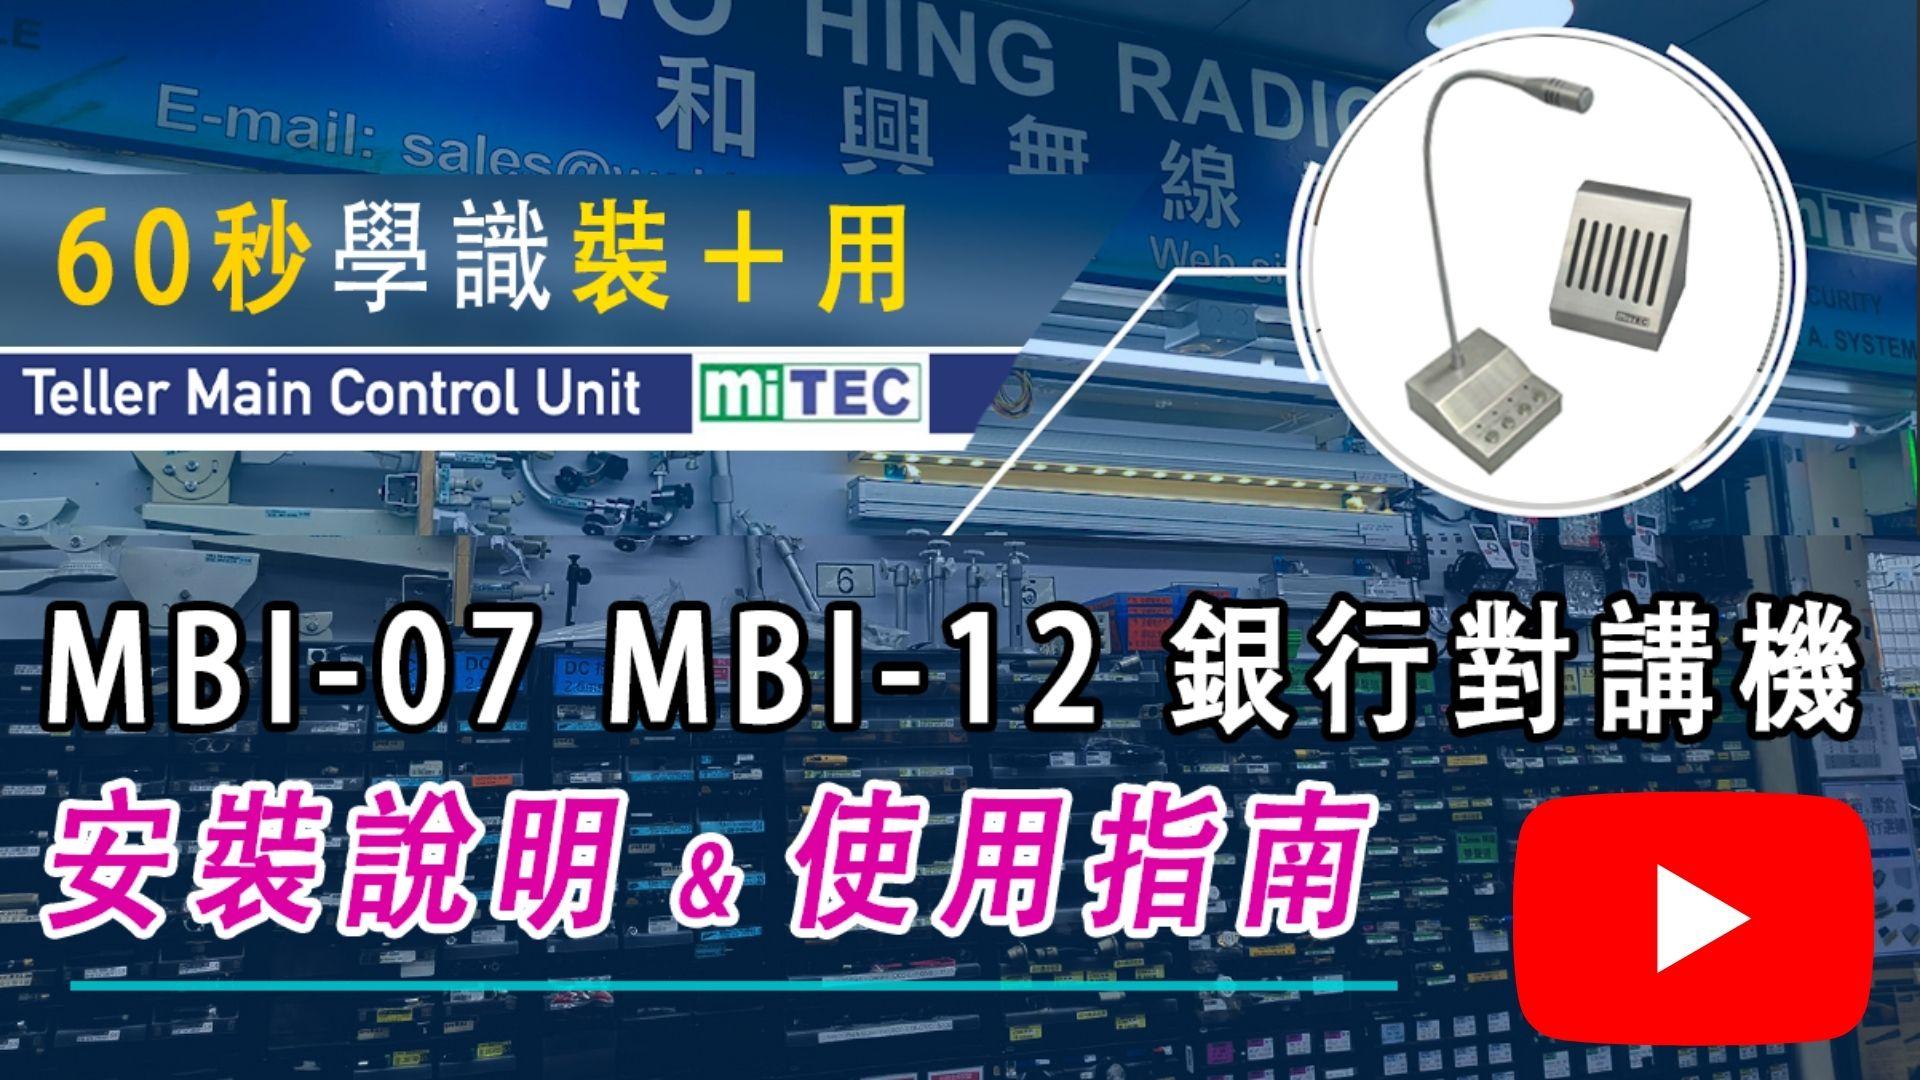 miTEC MBI 銀行對講機安裝及使用教學